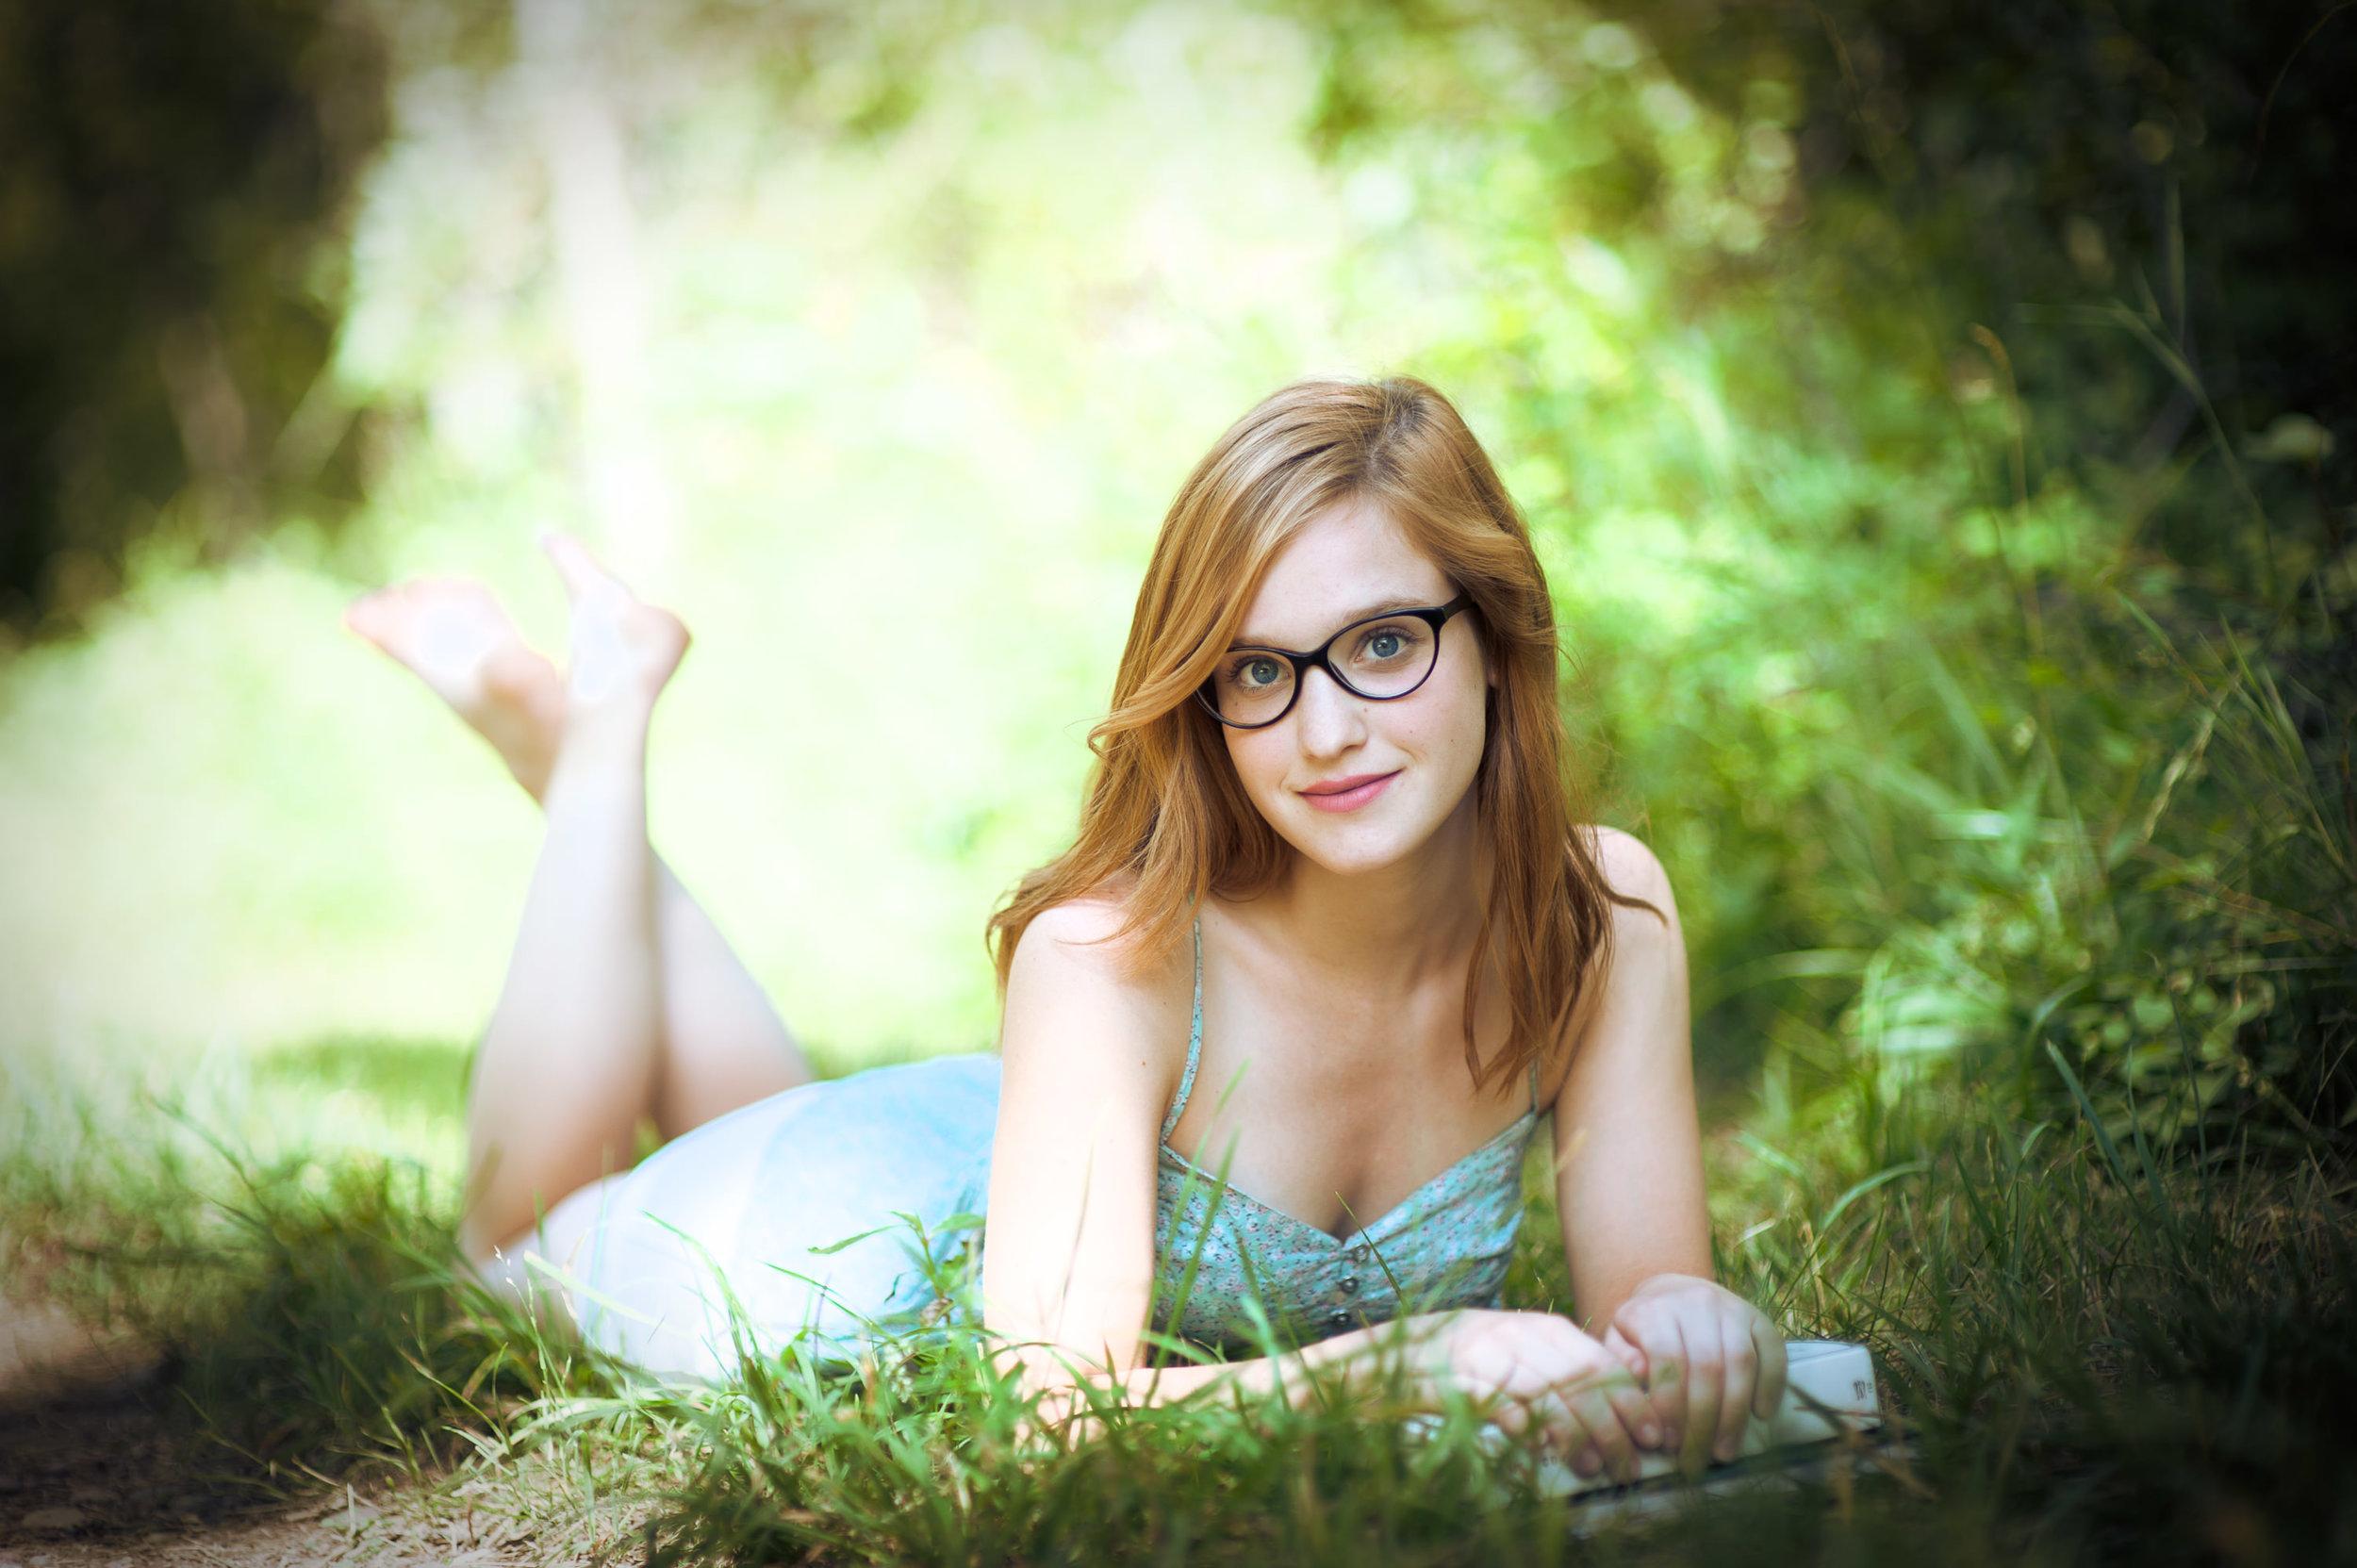 Montana-High-school-senior-Photographer-_DSC9932T.jpg